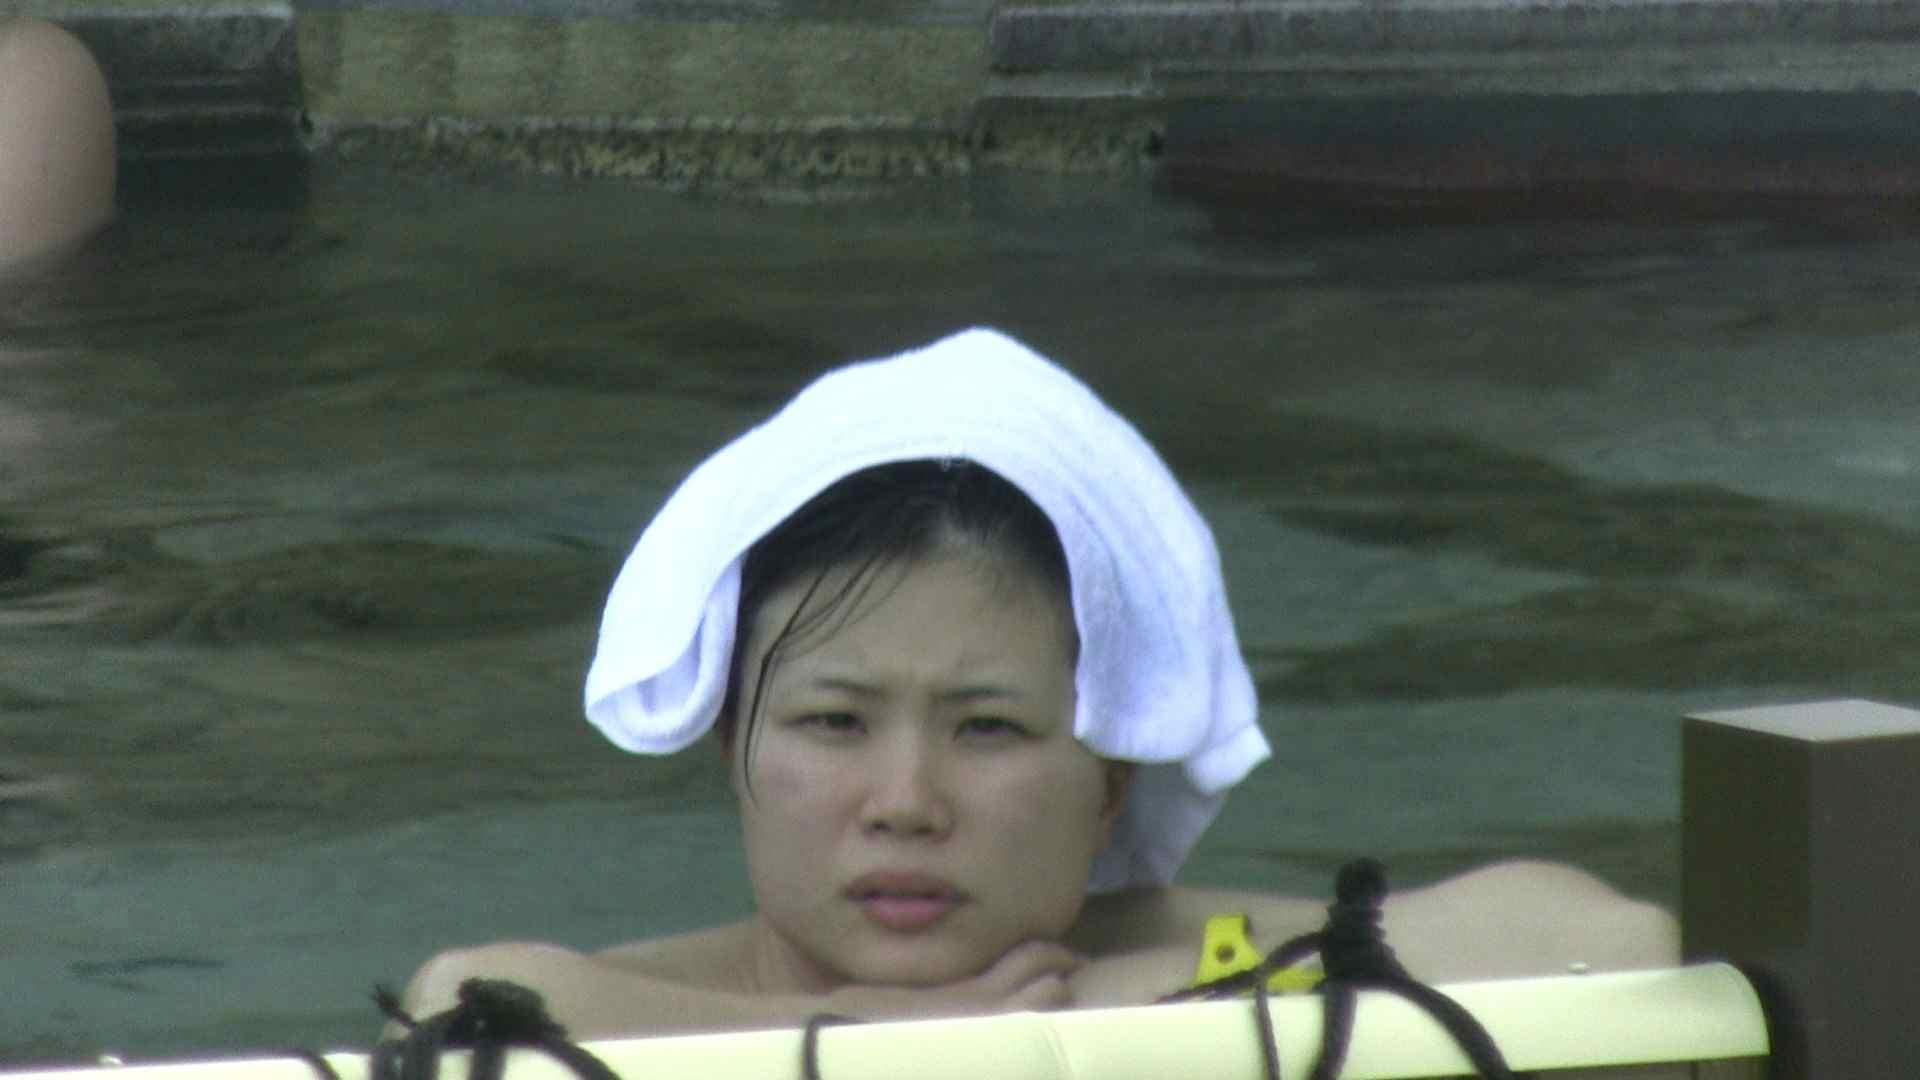 Aquaな露天風呂Vol.183 盗撮 | OLセックス  69画像 22